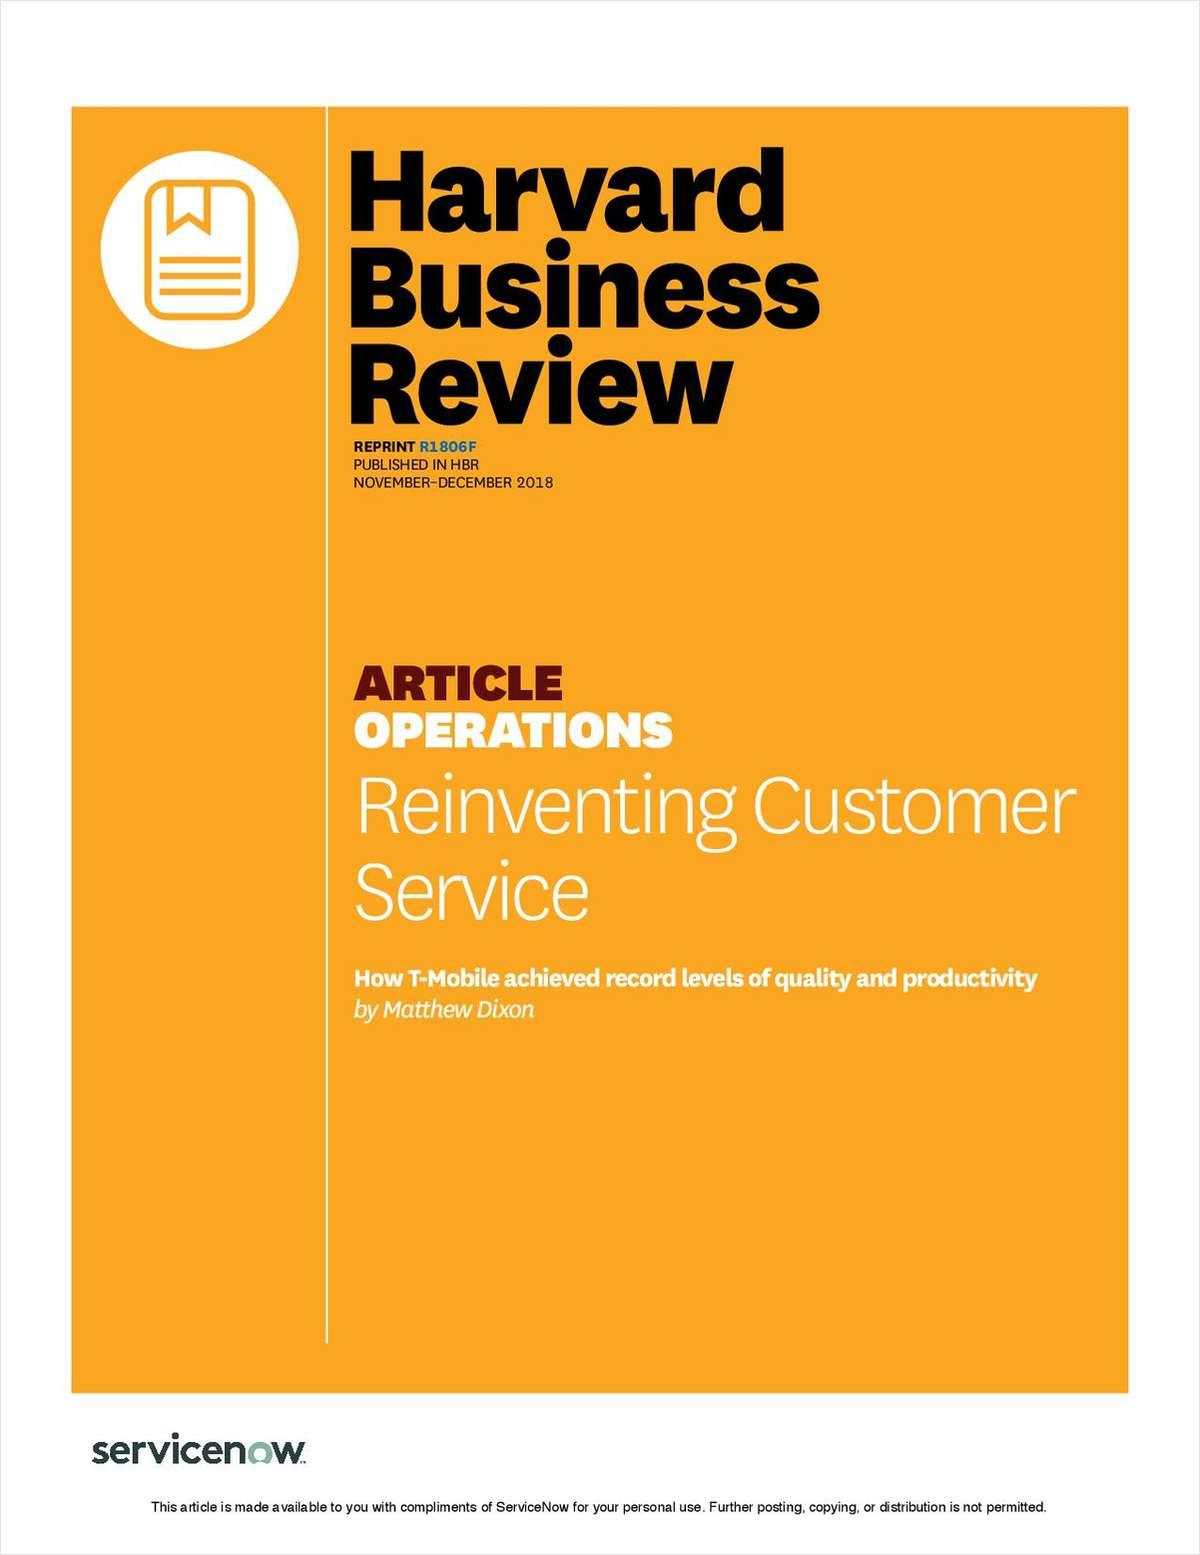 Reinventing Customer Service